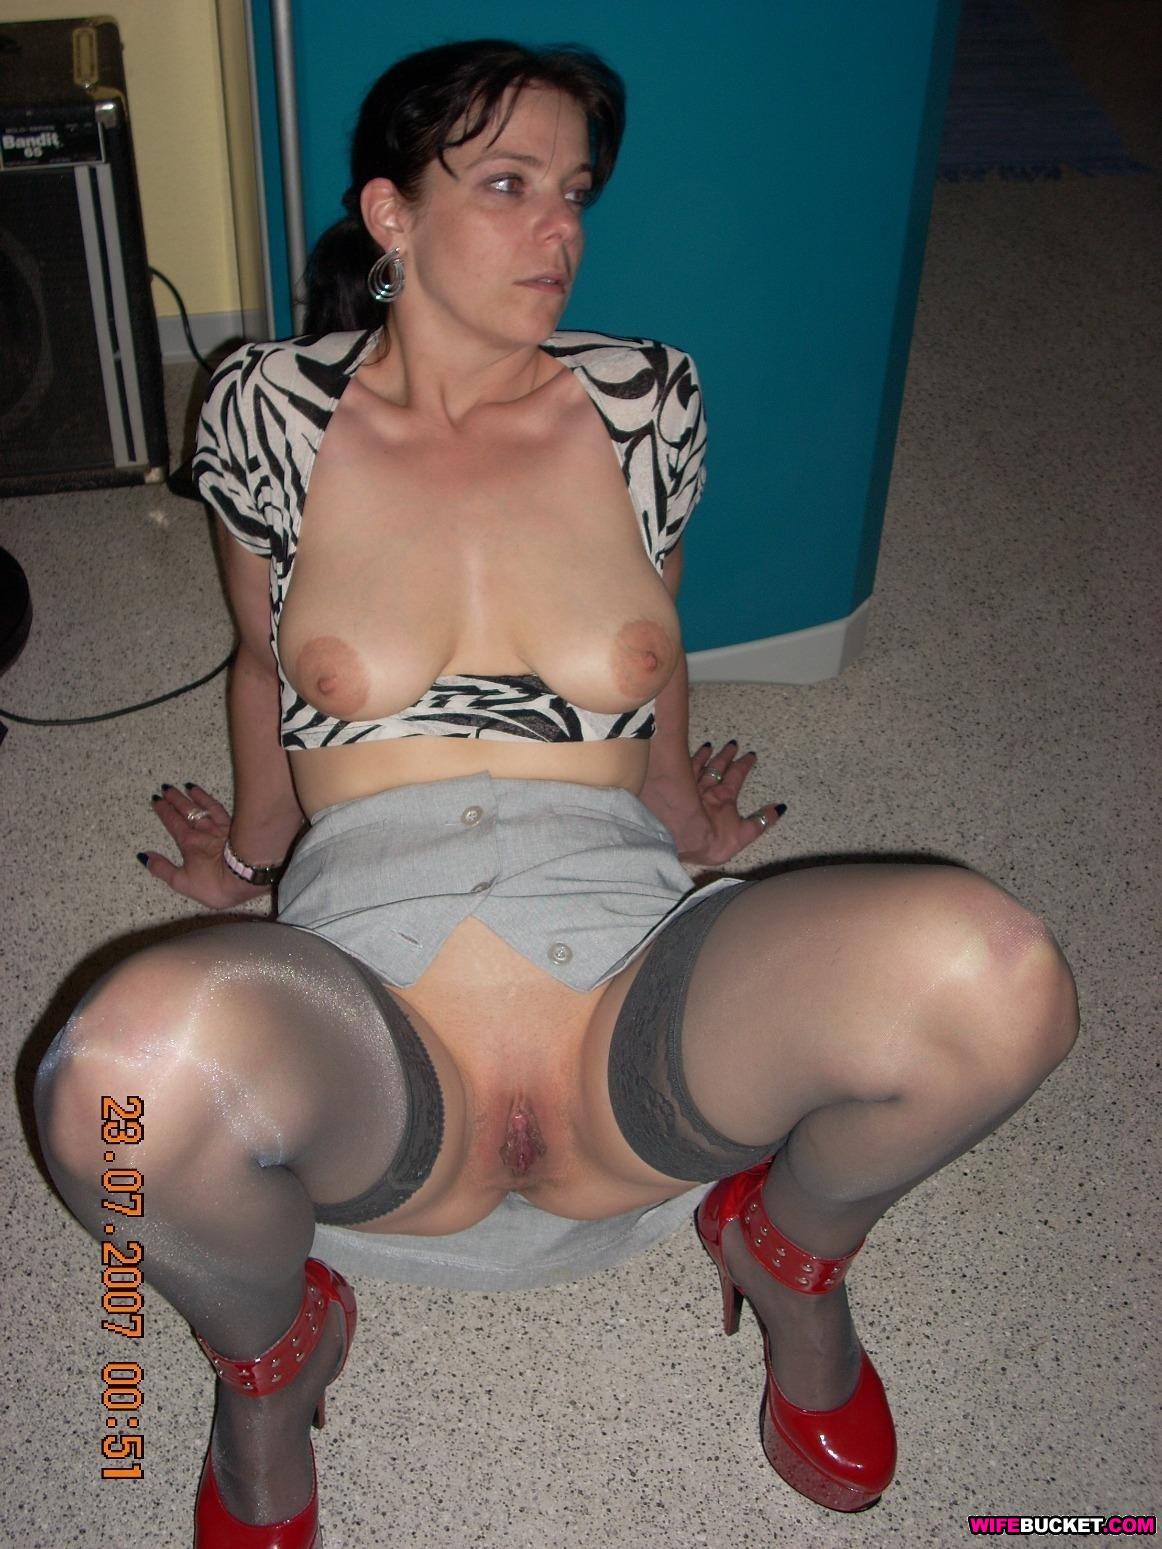 Fishnet big tits see thru lingerie